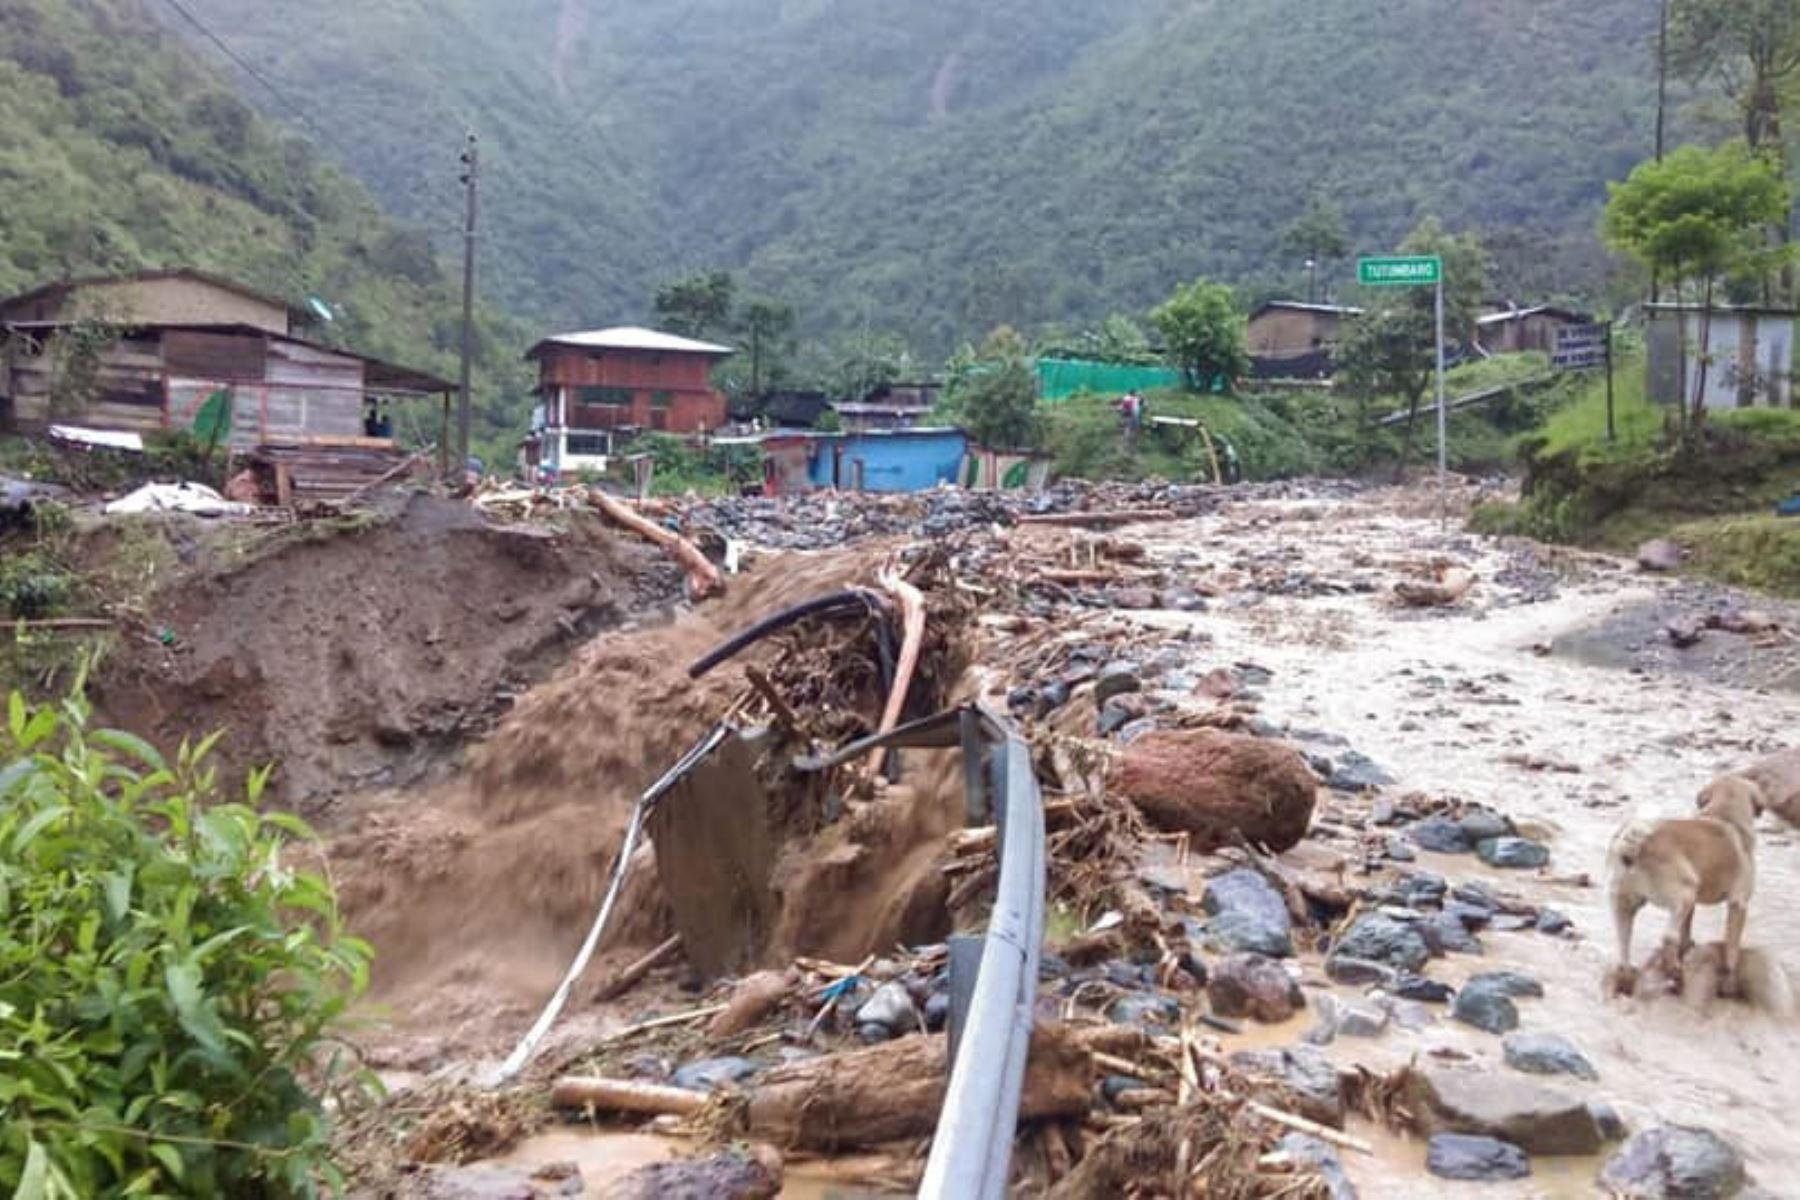 ANDINA/DifusiónCuatro desaparecidos y 20 viviendas destruidas deja caída de huaico en Ayacucho. ANDINA/Difusión